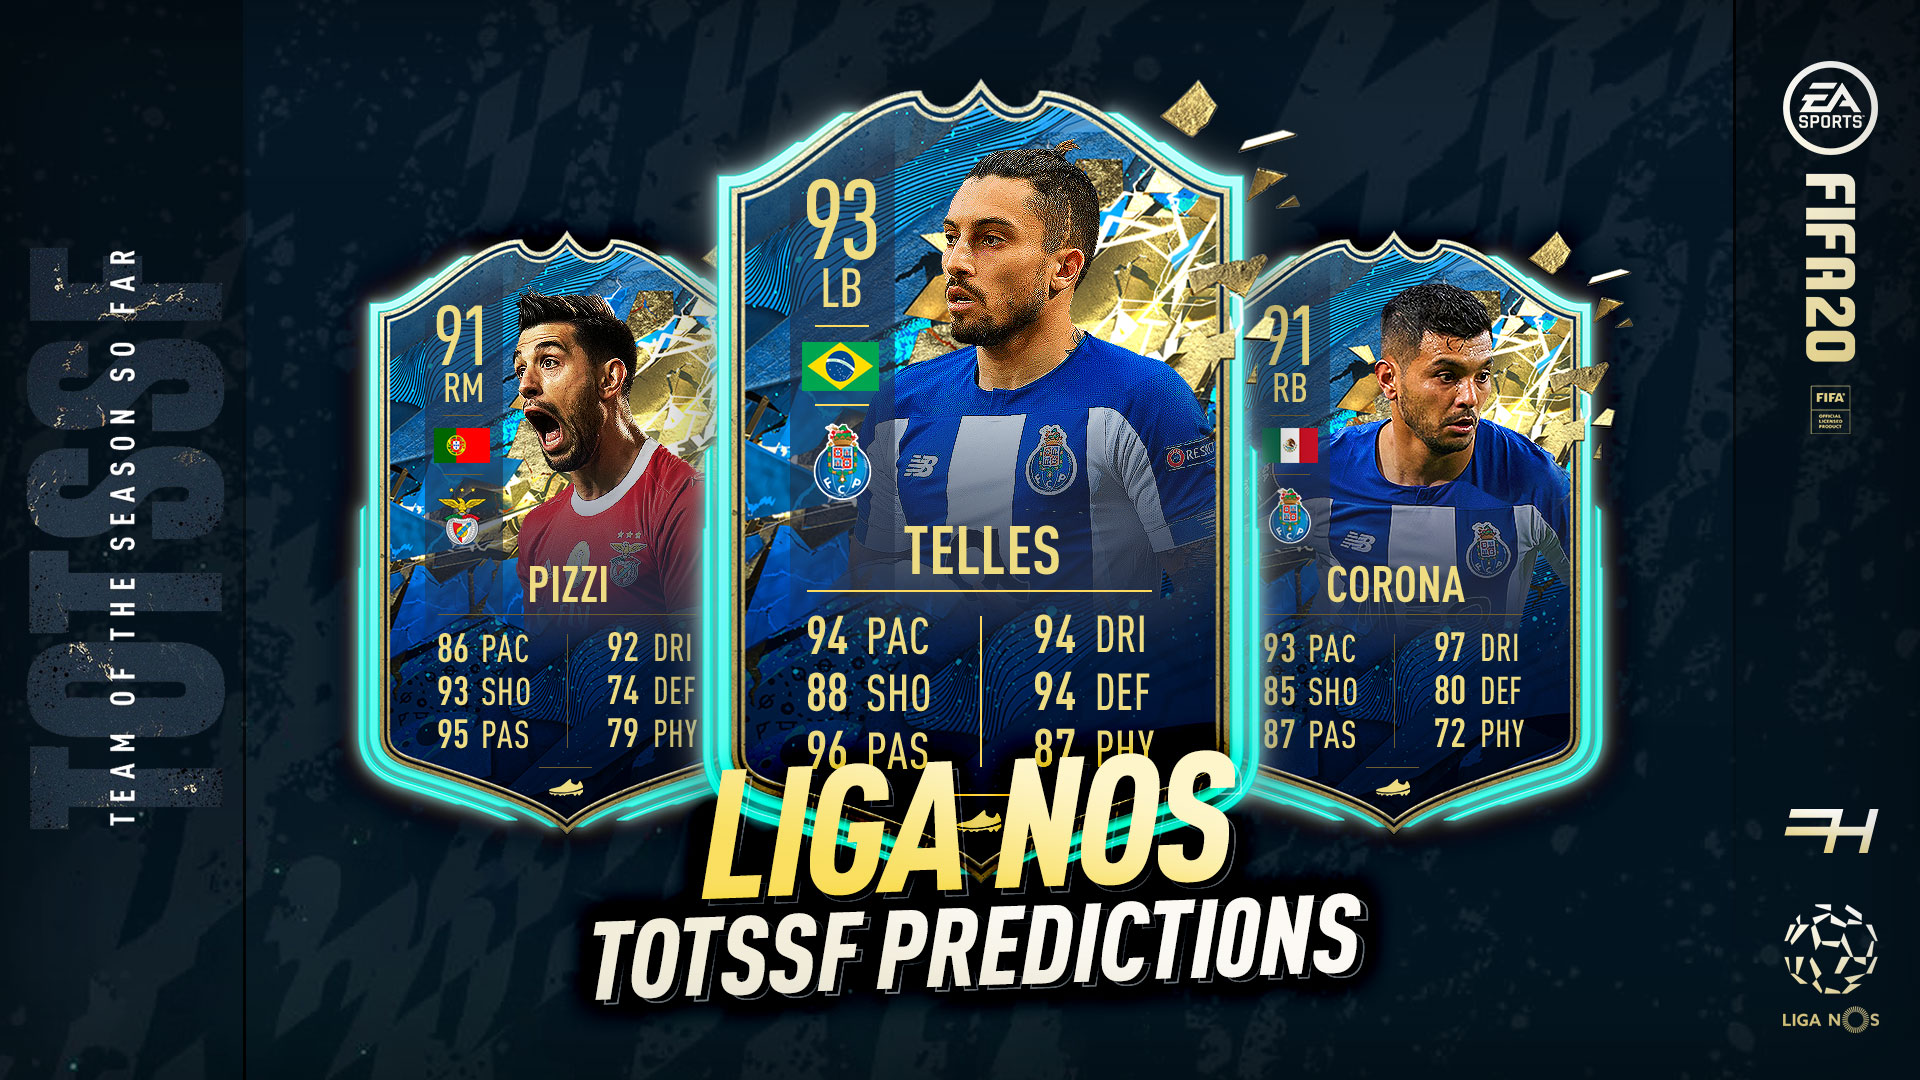 Fifa 20 Totssf Predictions Liga Nos Futhead News